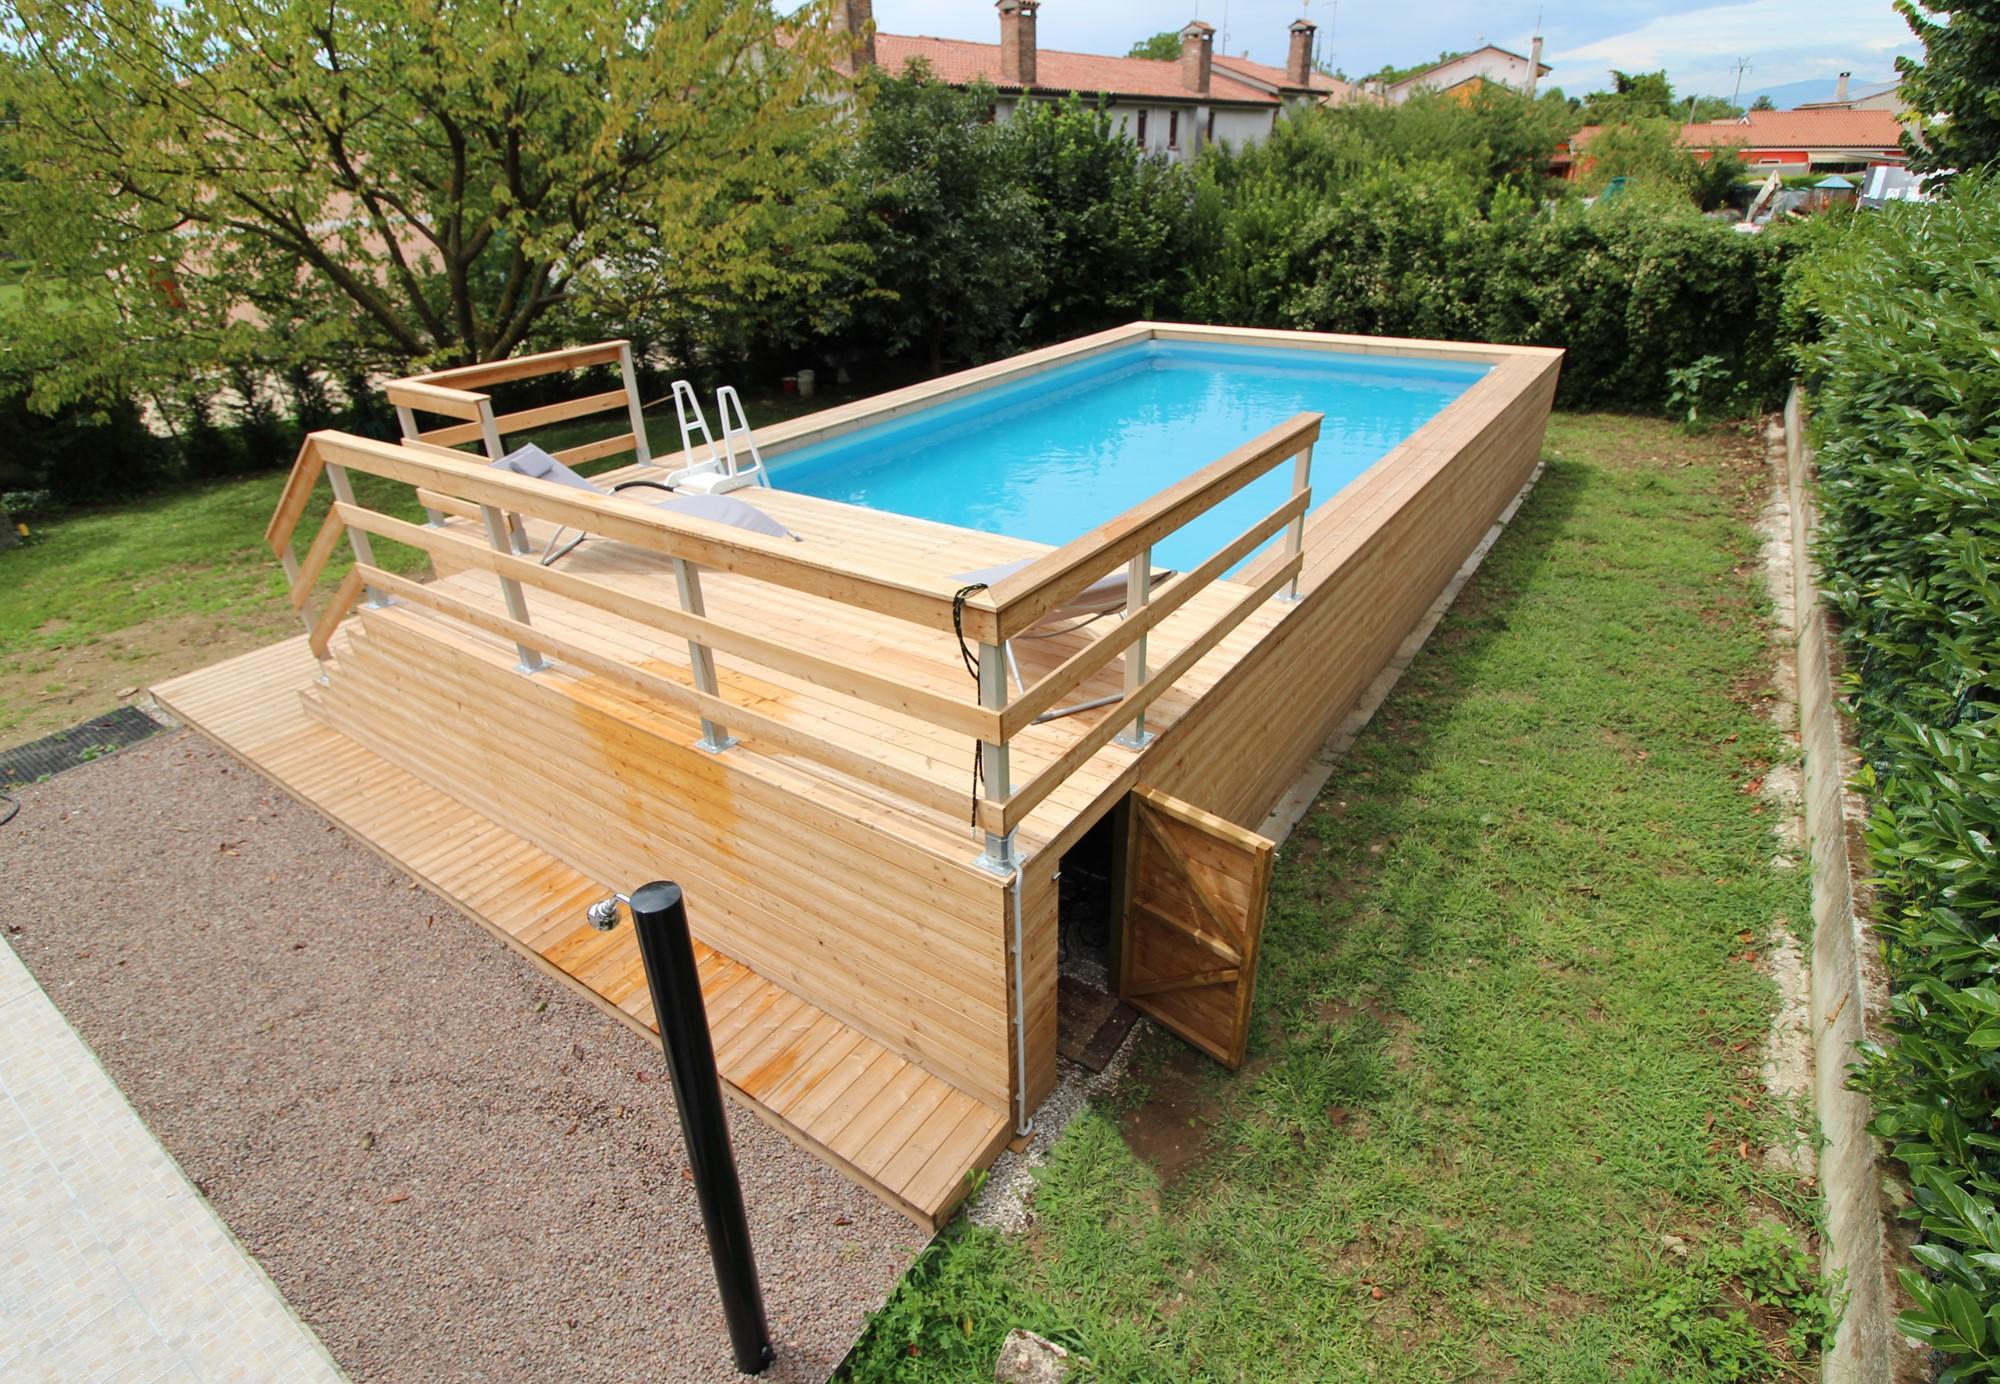 Solarium per piscine fuori terra hu27 regardsdefemmes - Piscina da interno ...